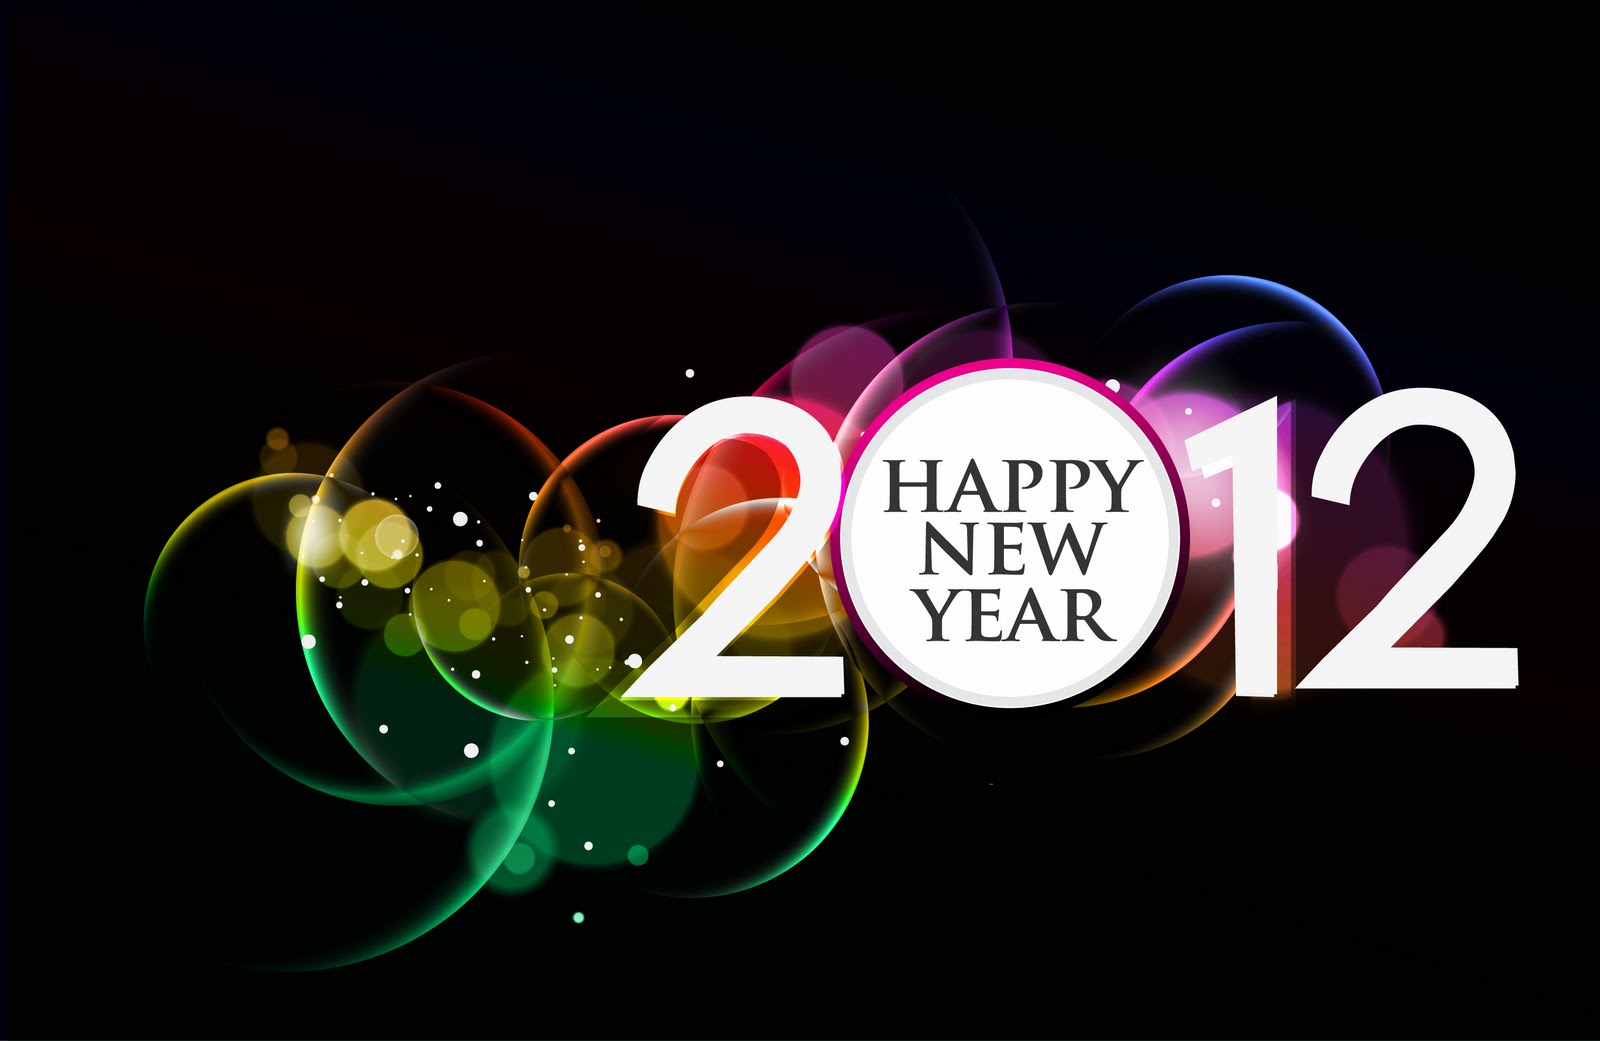 https://2.bp.blogspot.com/-Cw9OJAmx8O0/TwCa9ky8raI/AAAAAAAAAHc/5kVGpPK-AUg/s1600/Happy-New-Year-2012-wallpaper.jpg